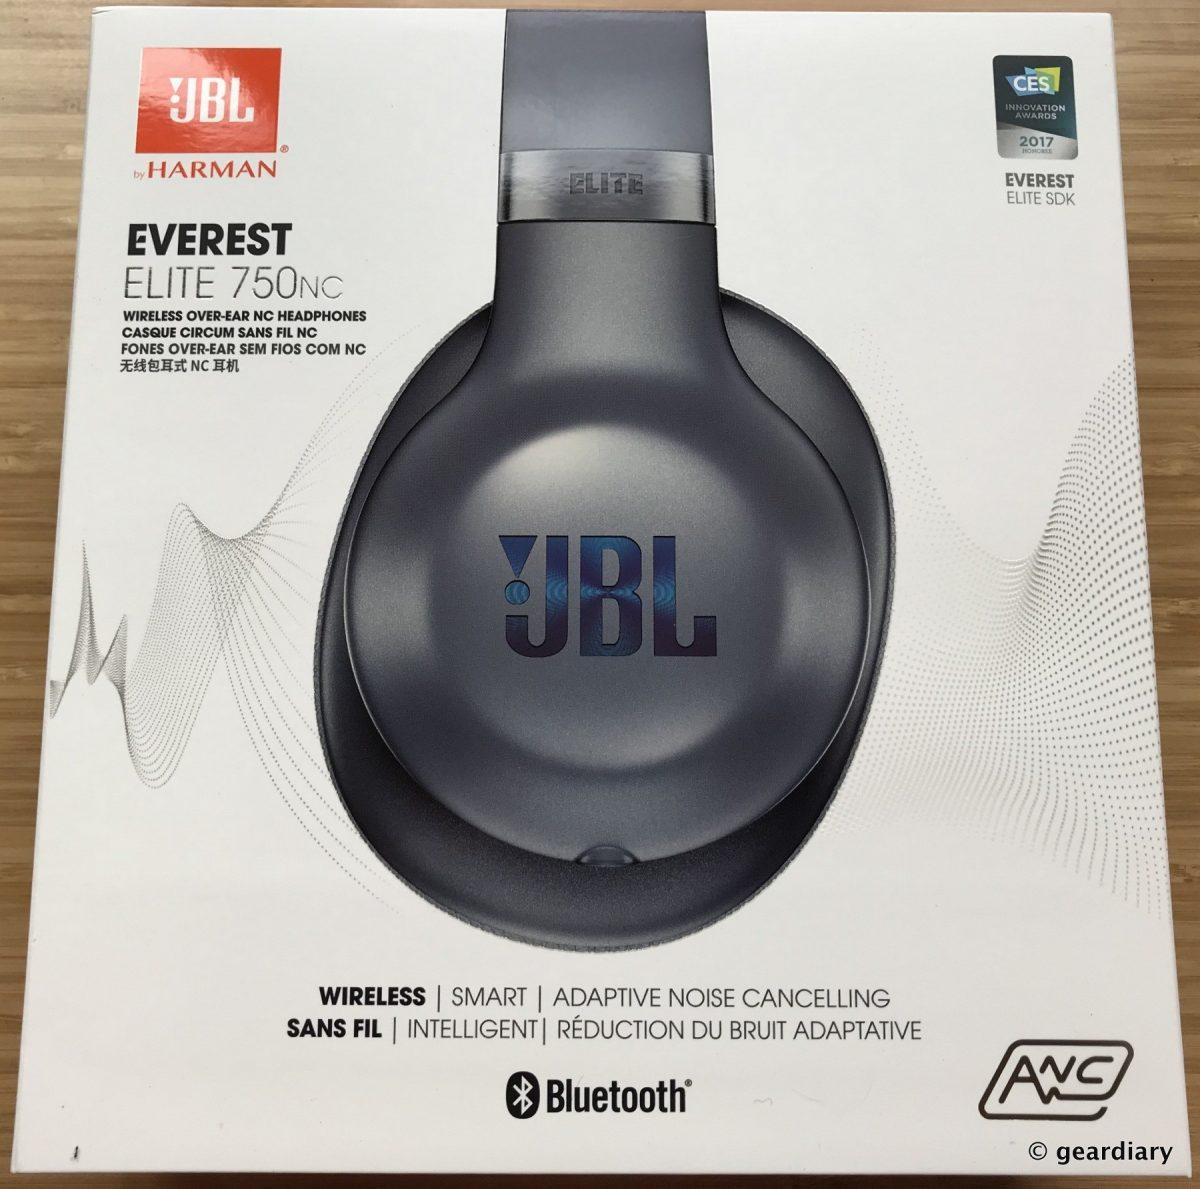 773ec548316 01-JBL Everest Elite 750 NC Wireless Over Ear Noise Canceling Headphones